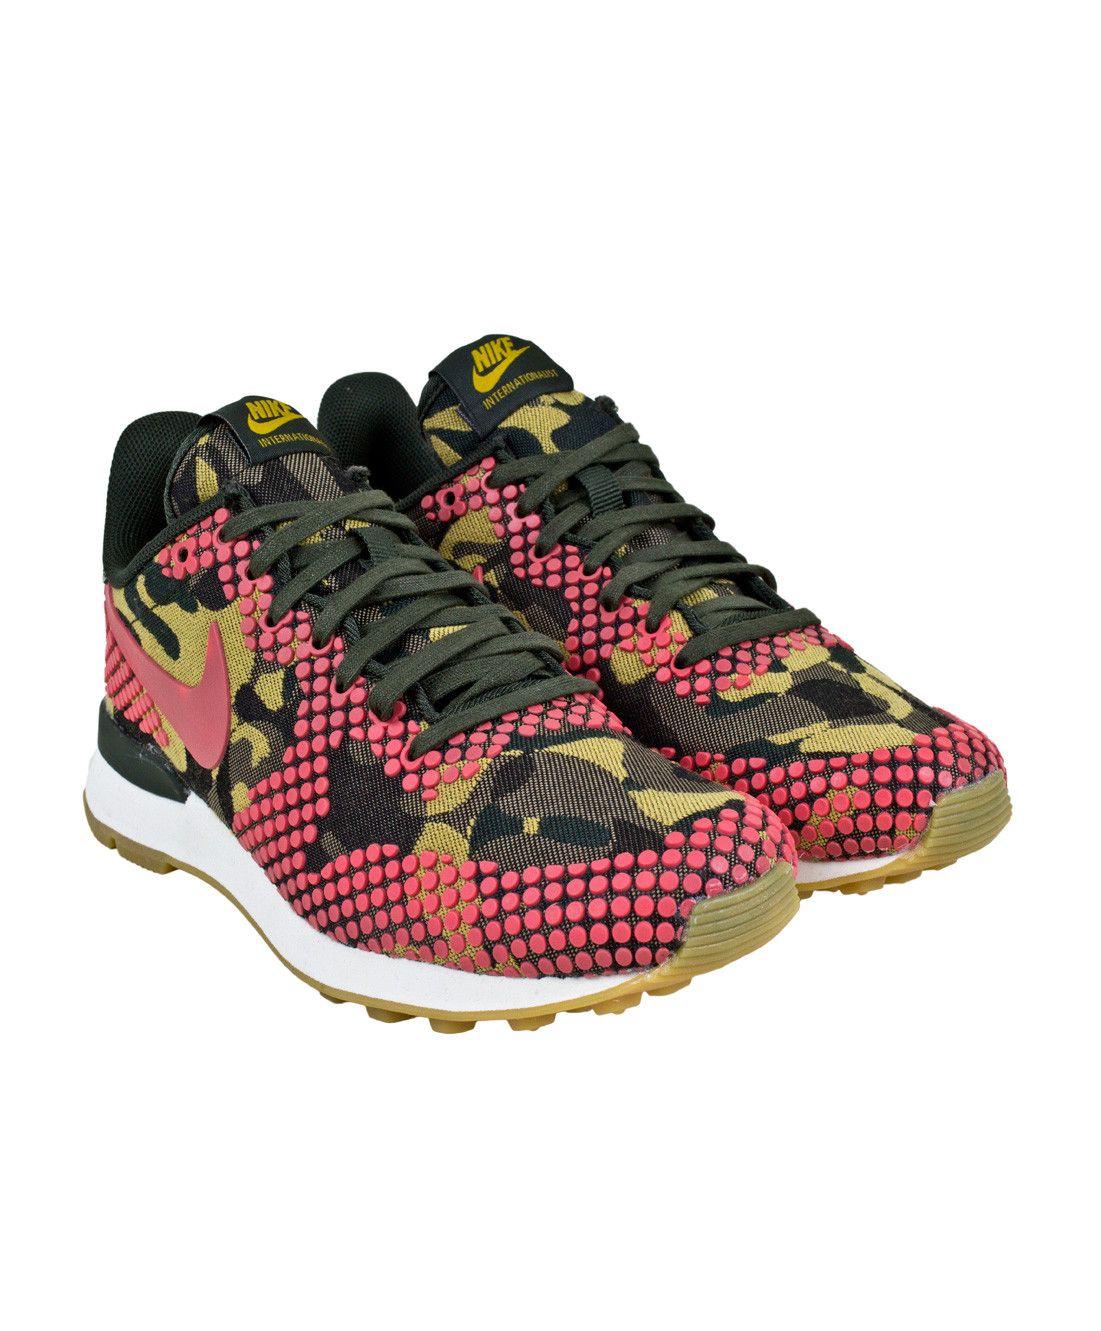 Nike Women's Internationalist JCRD Premium [807407-200]